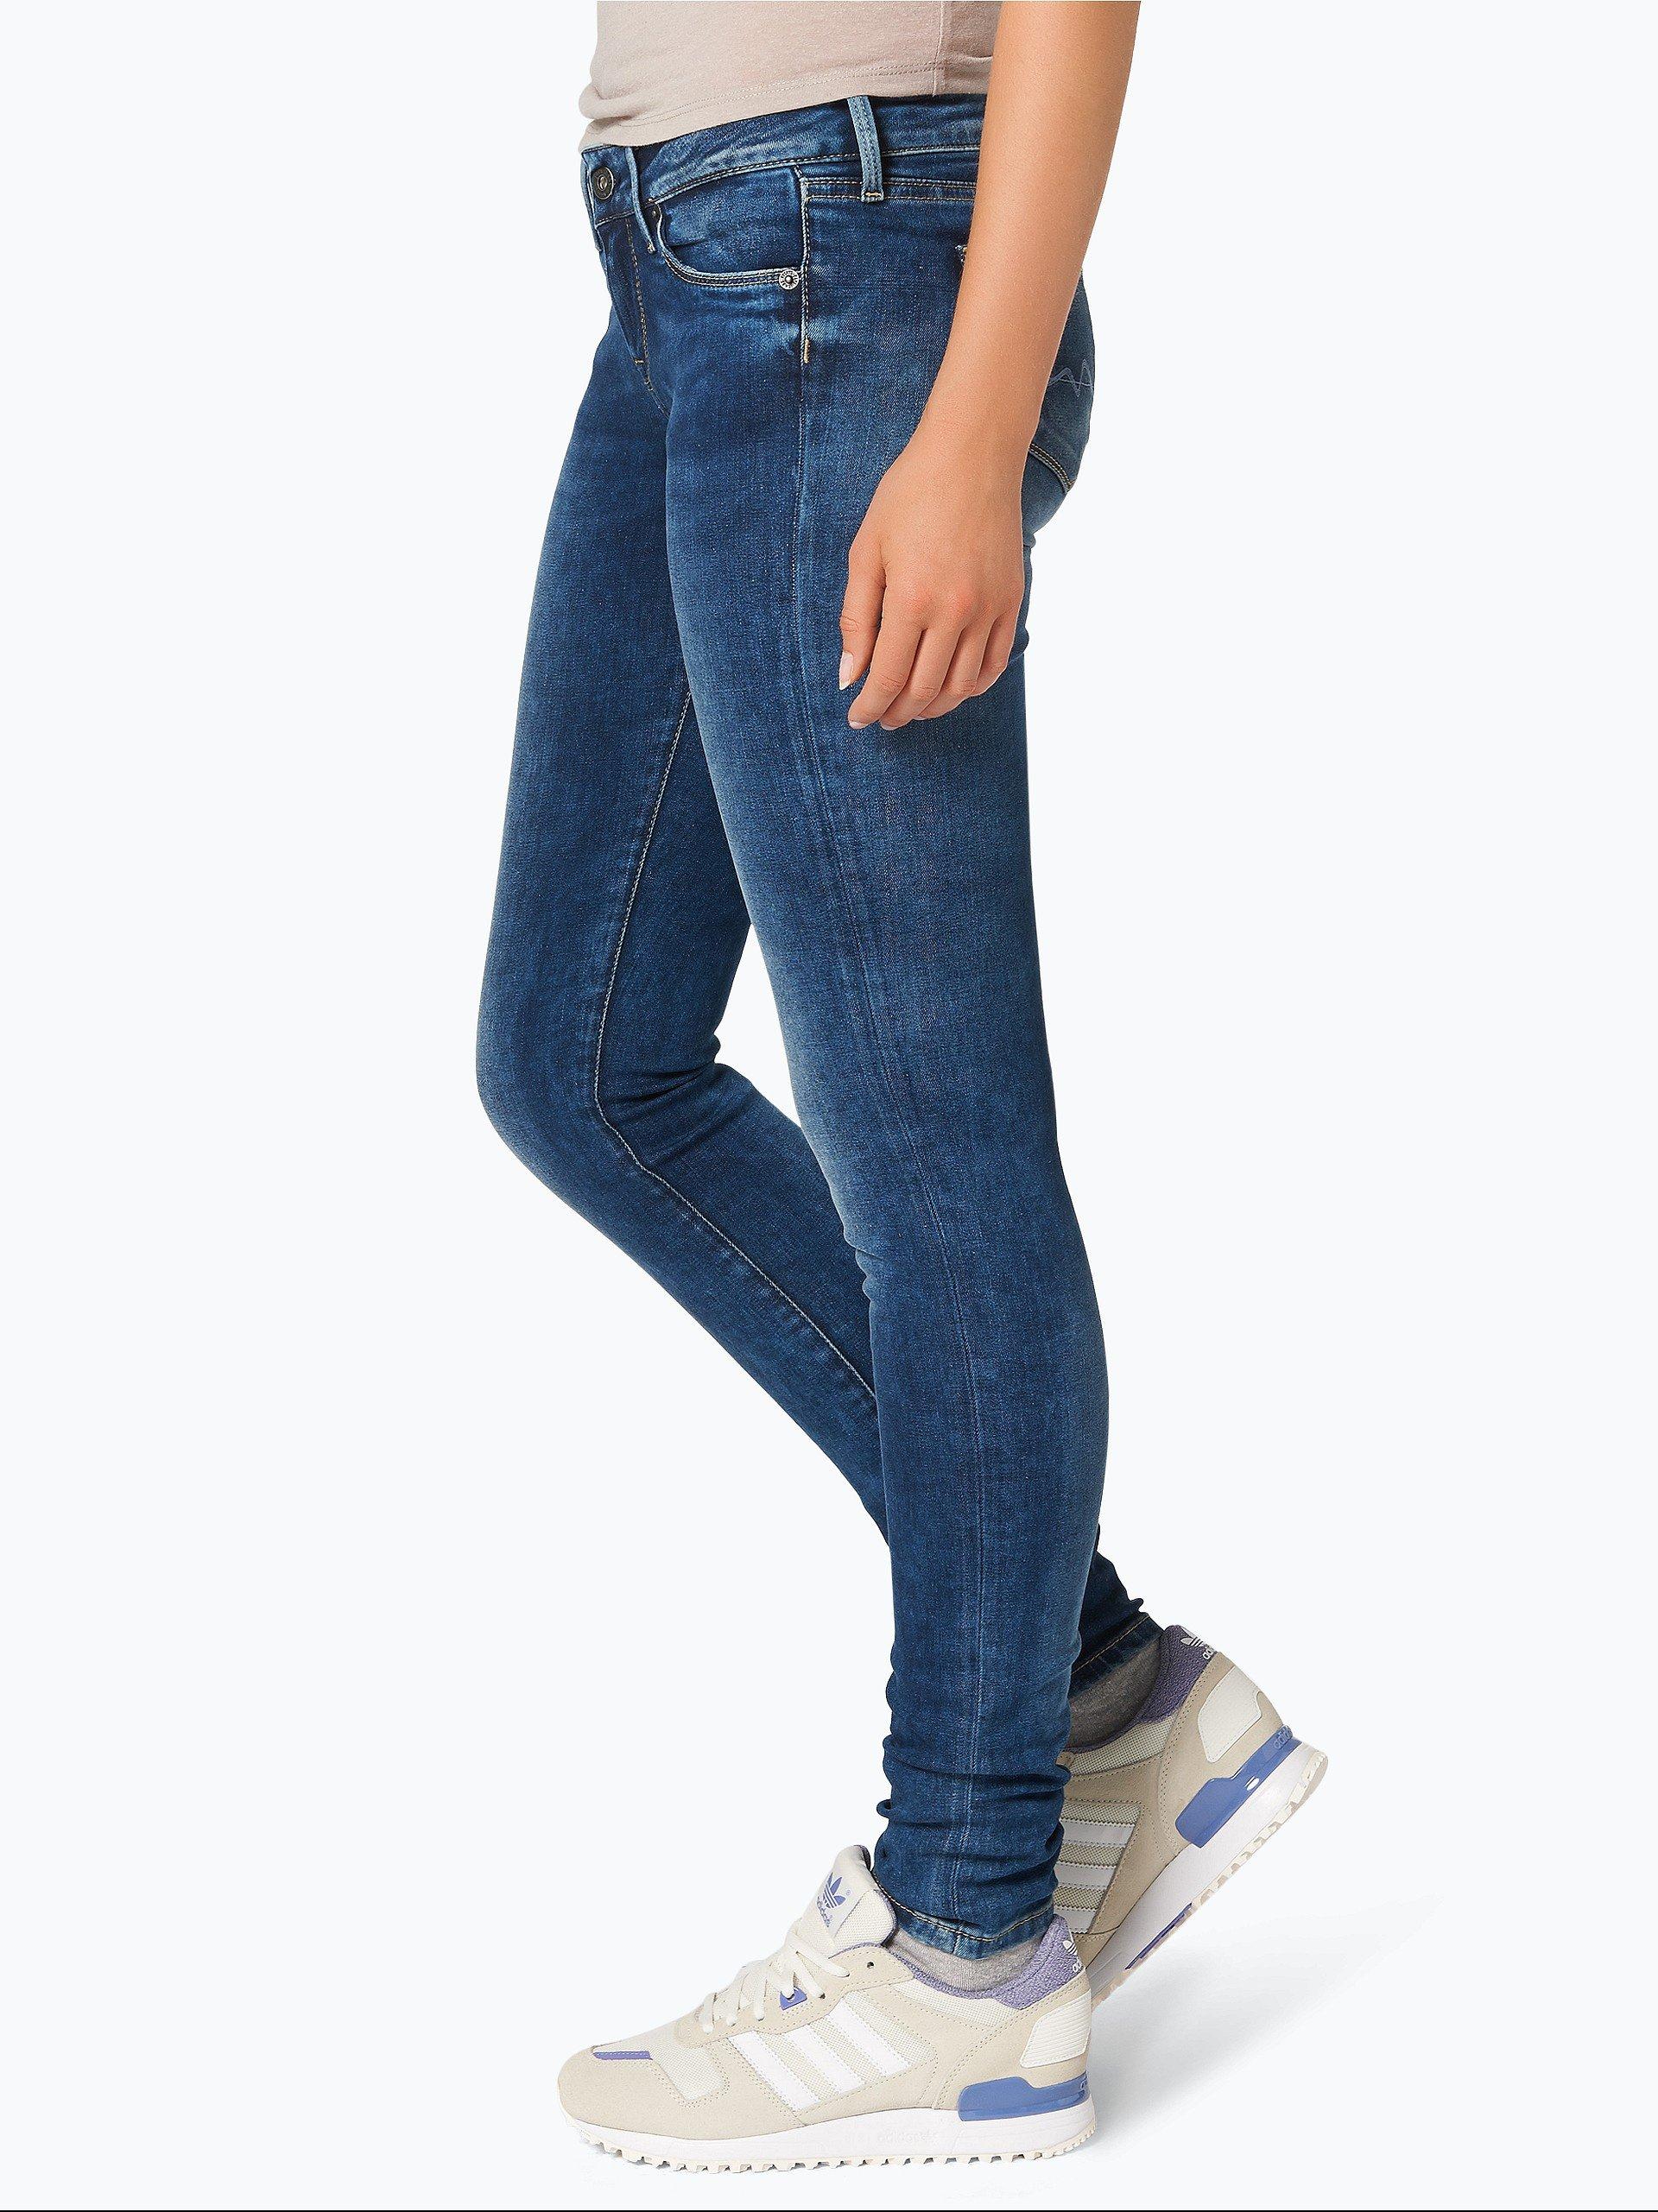 pepe jeans damen jeans soho blau uni online kaufen. Black Bedroom Furniture Sets. Home Design Ideas